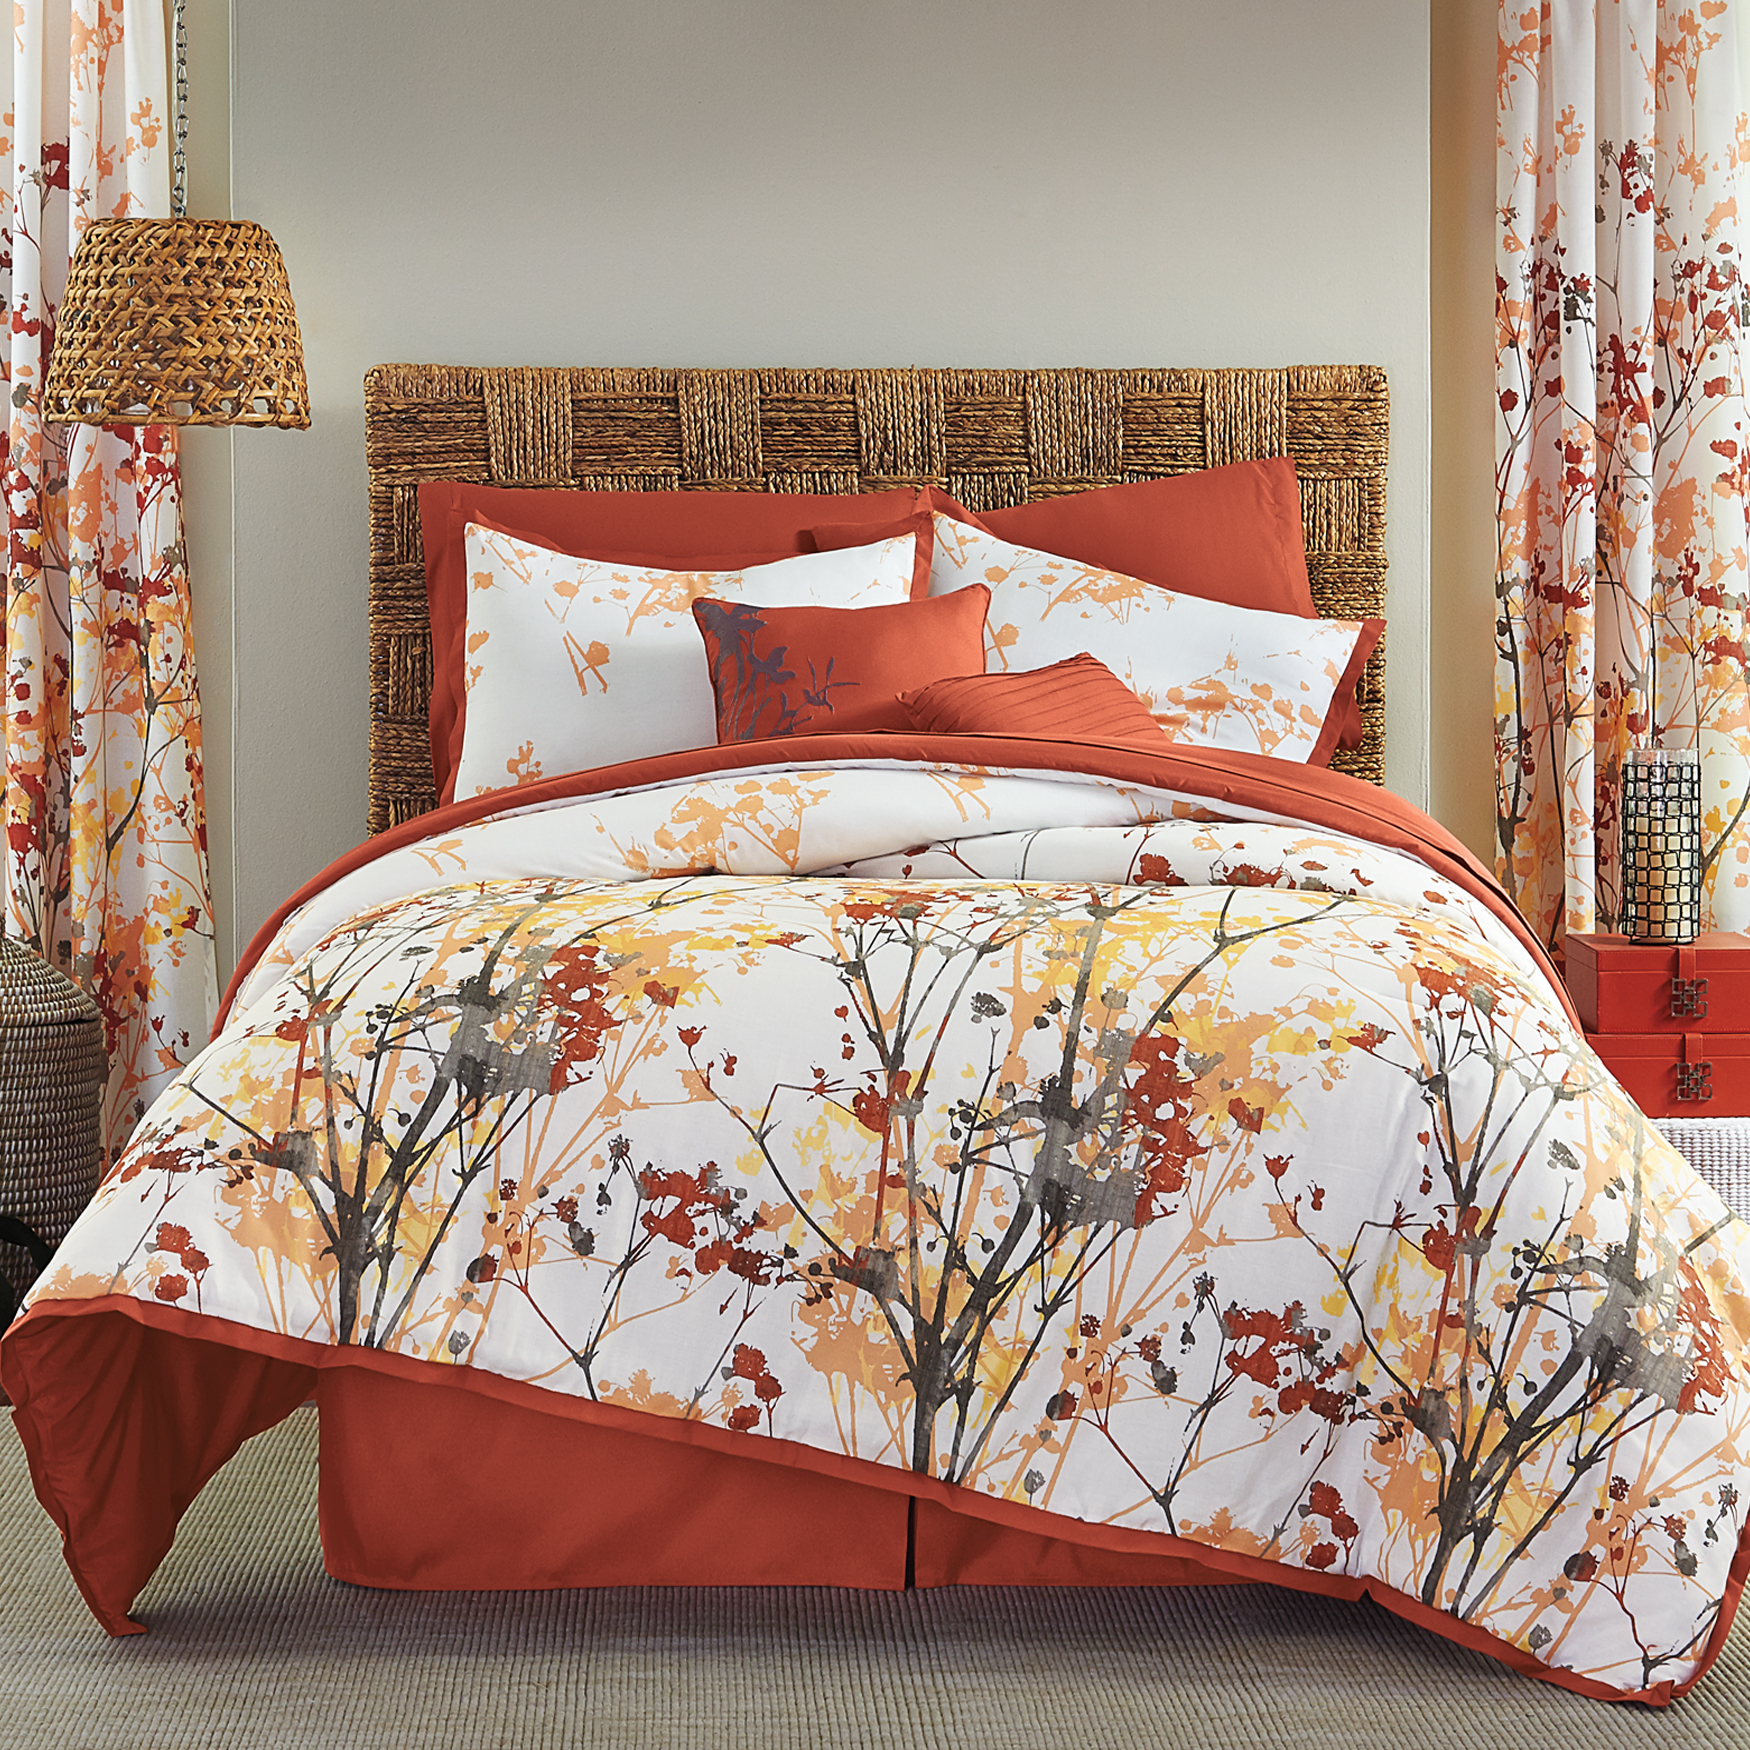 Funky Floral 6 Pc Comforter Set Brylane Home